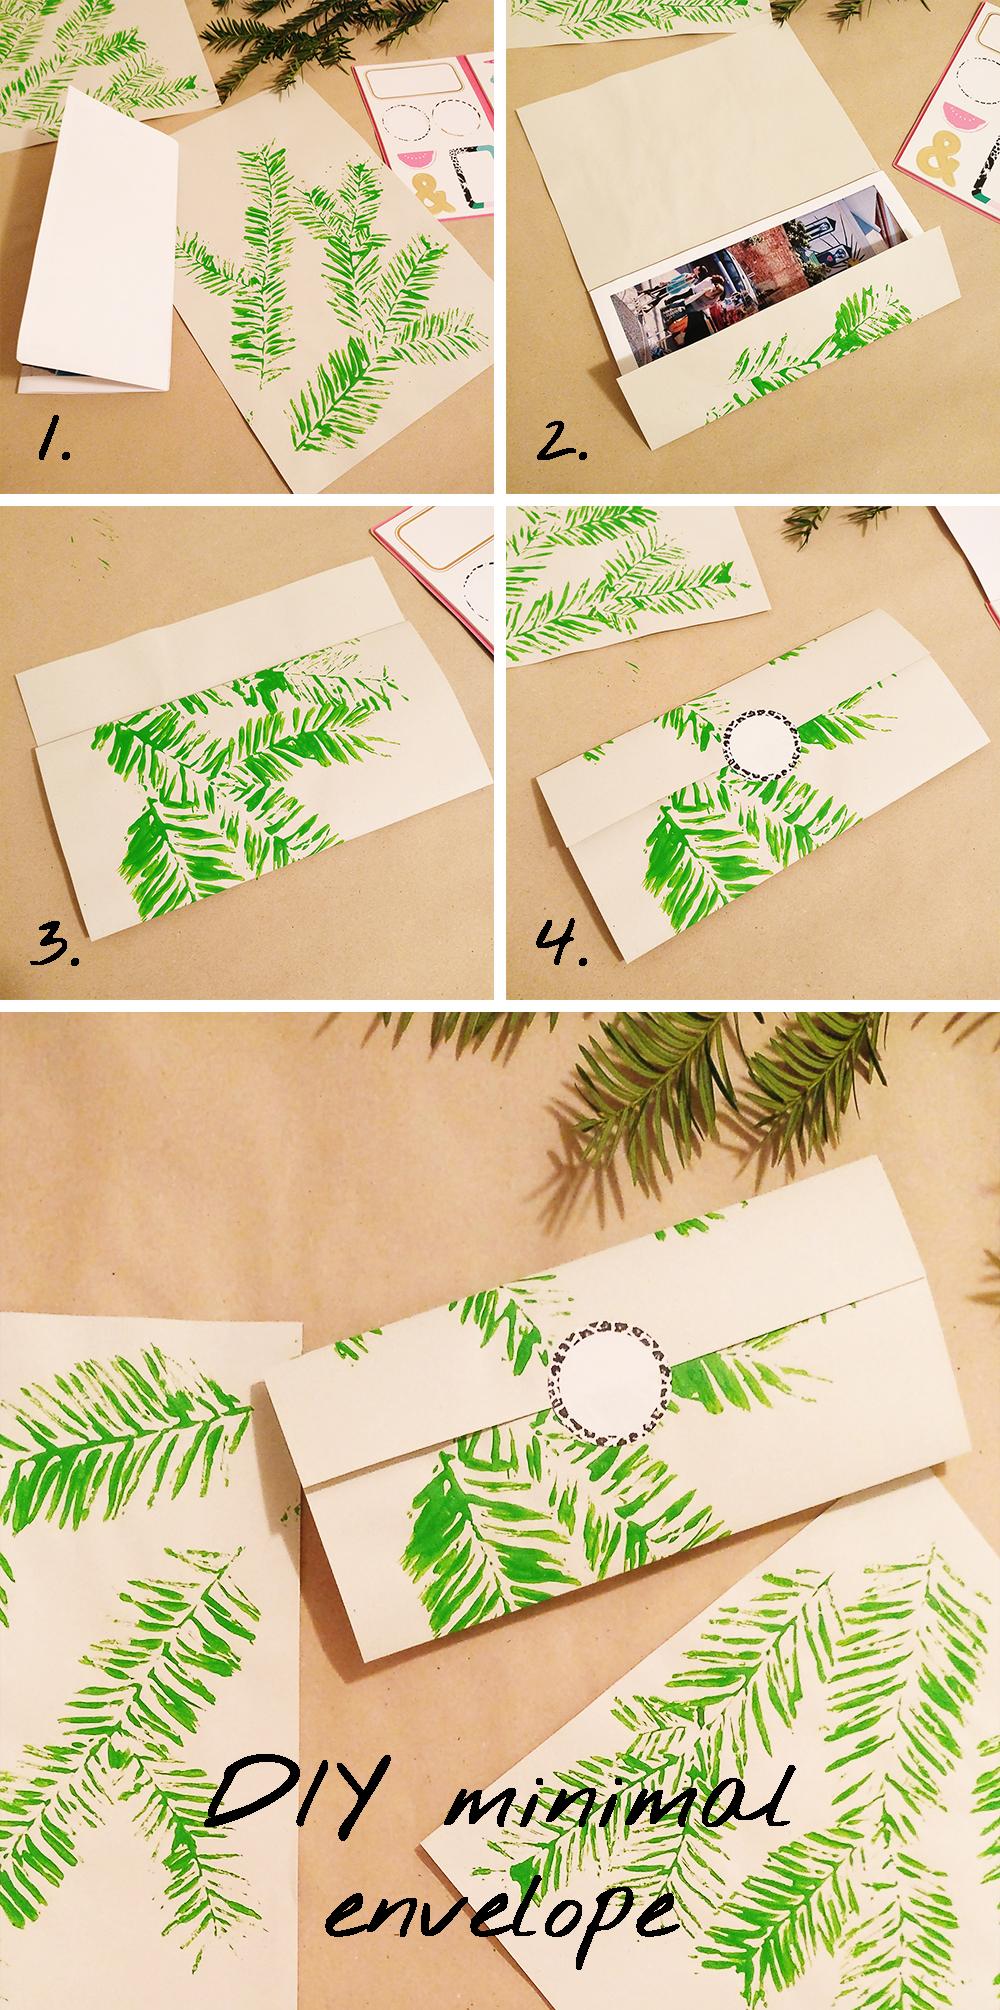 DIY Origami minimal envelope | Aliz's Wonderland